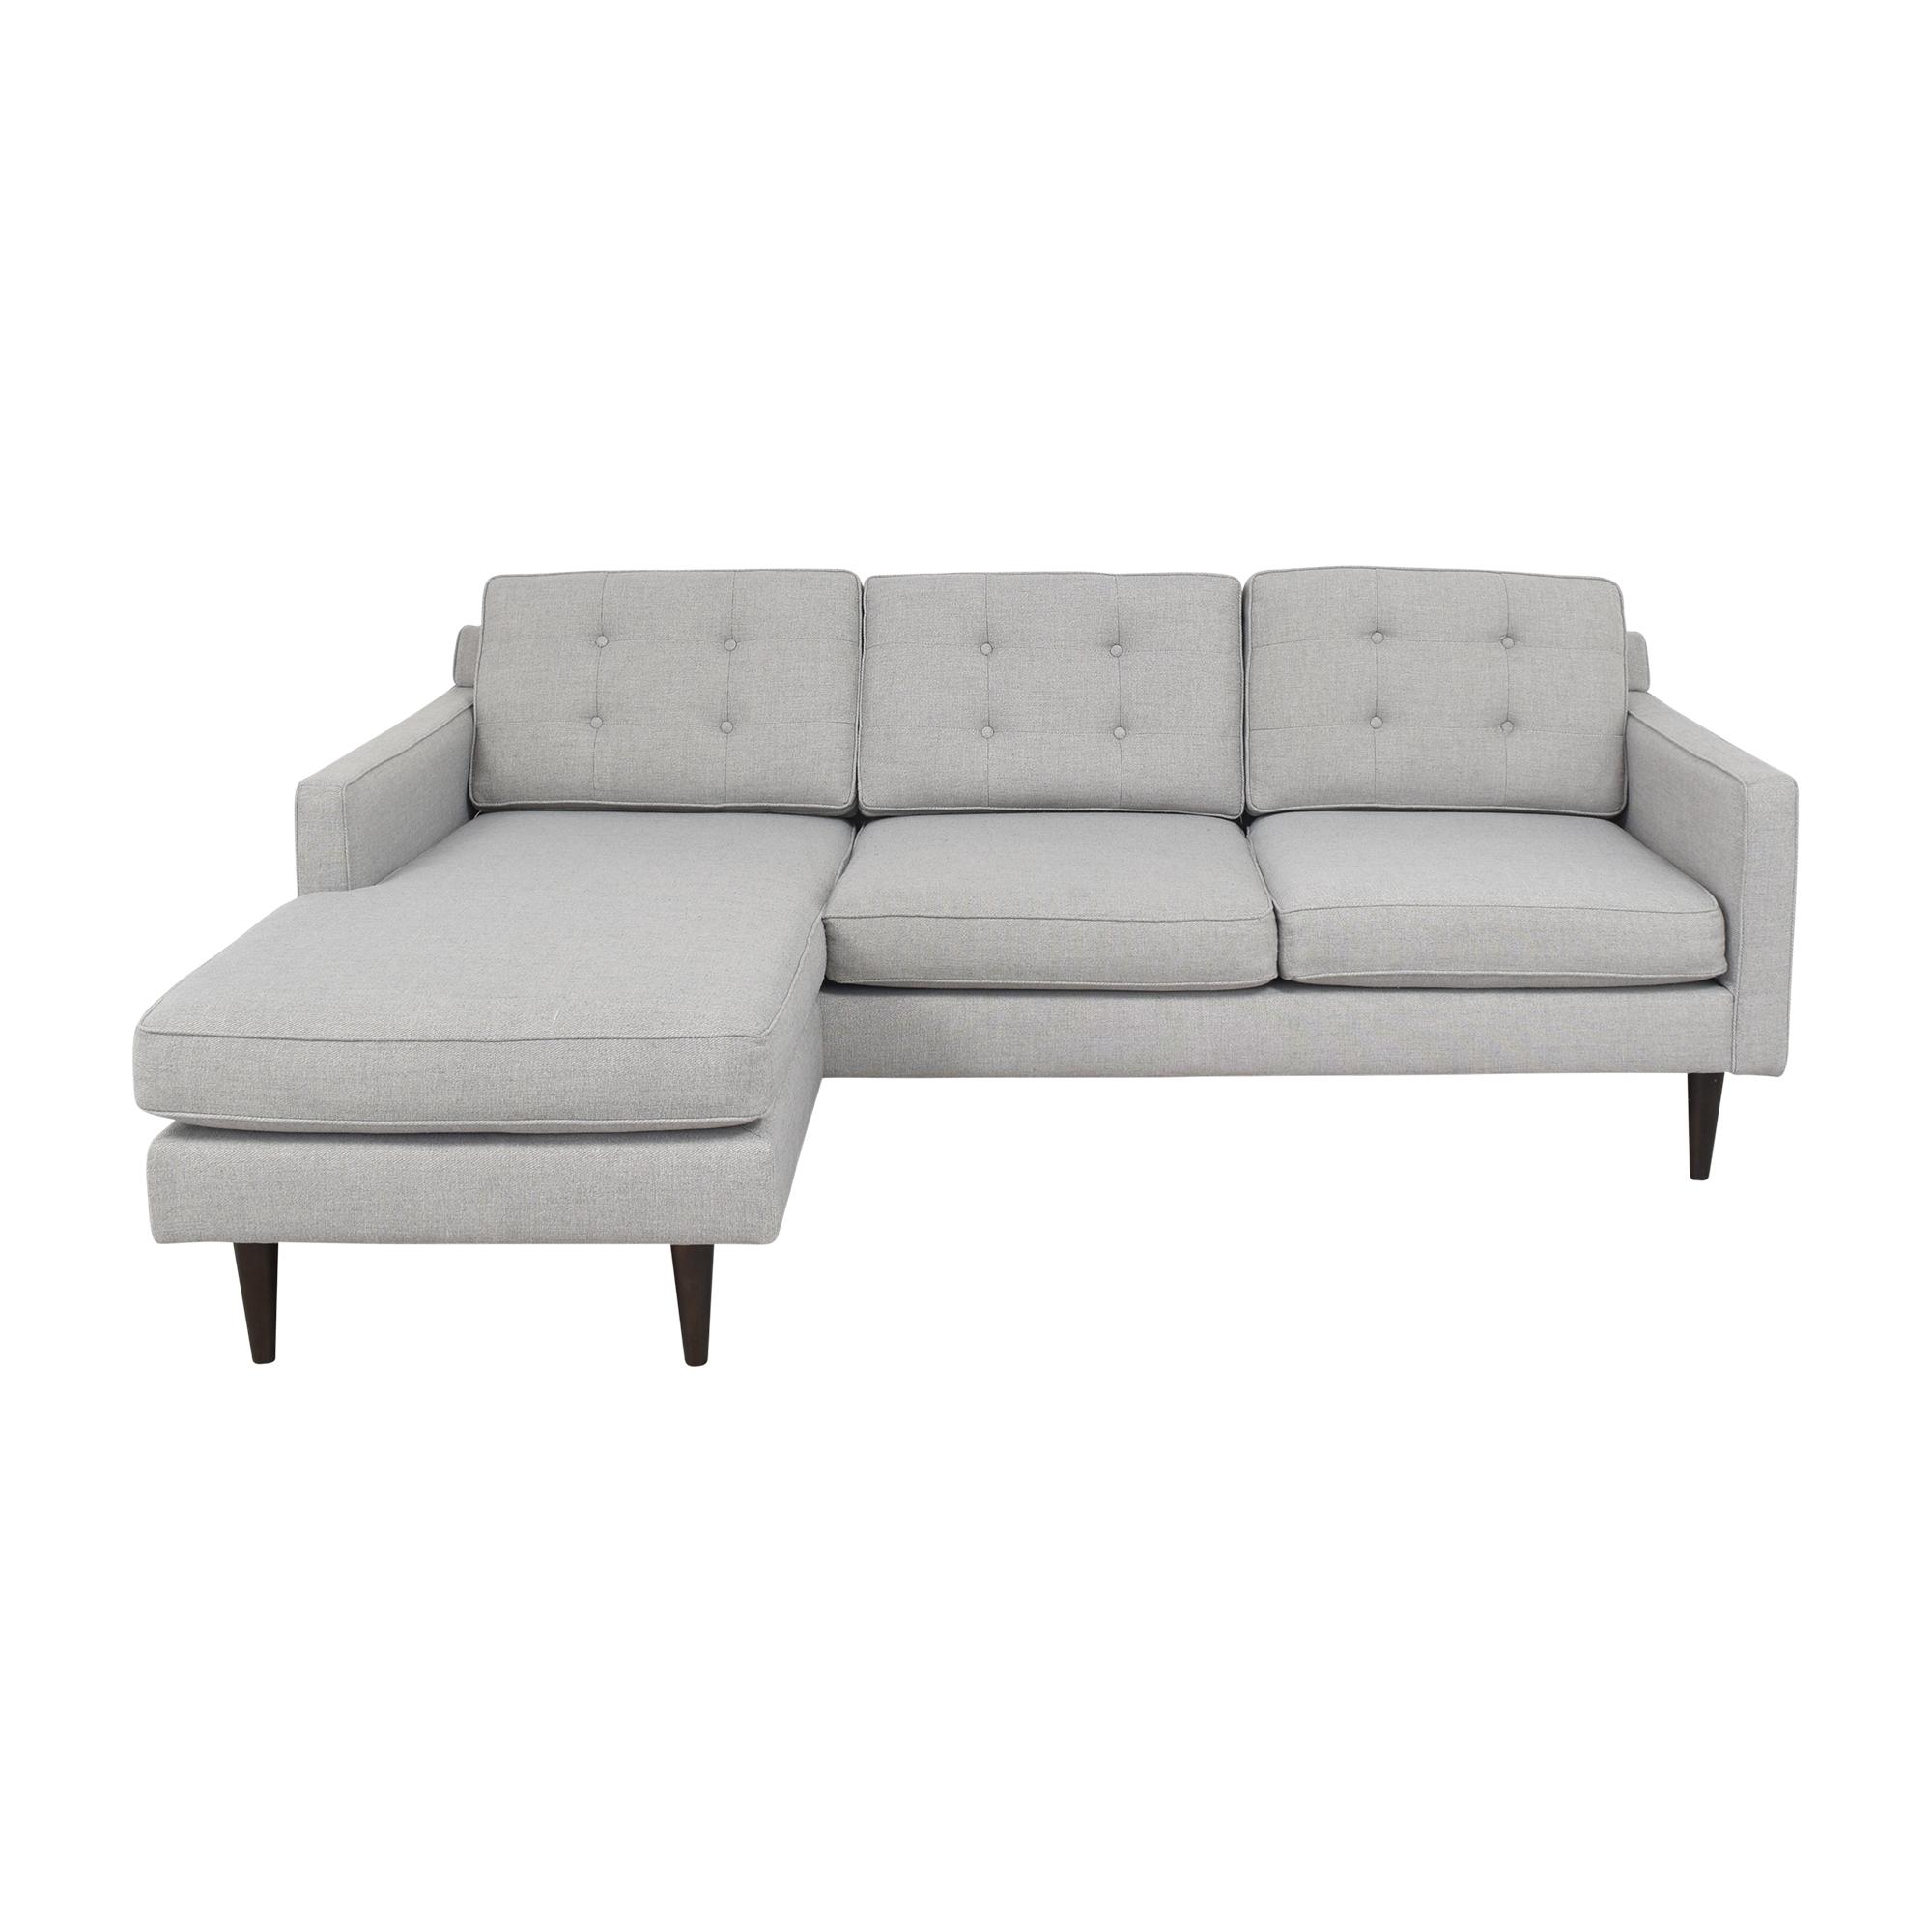 buy West Elm West Elm Drake Reversible Sectional Sofa online